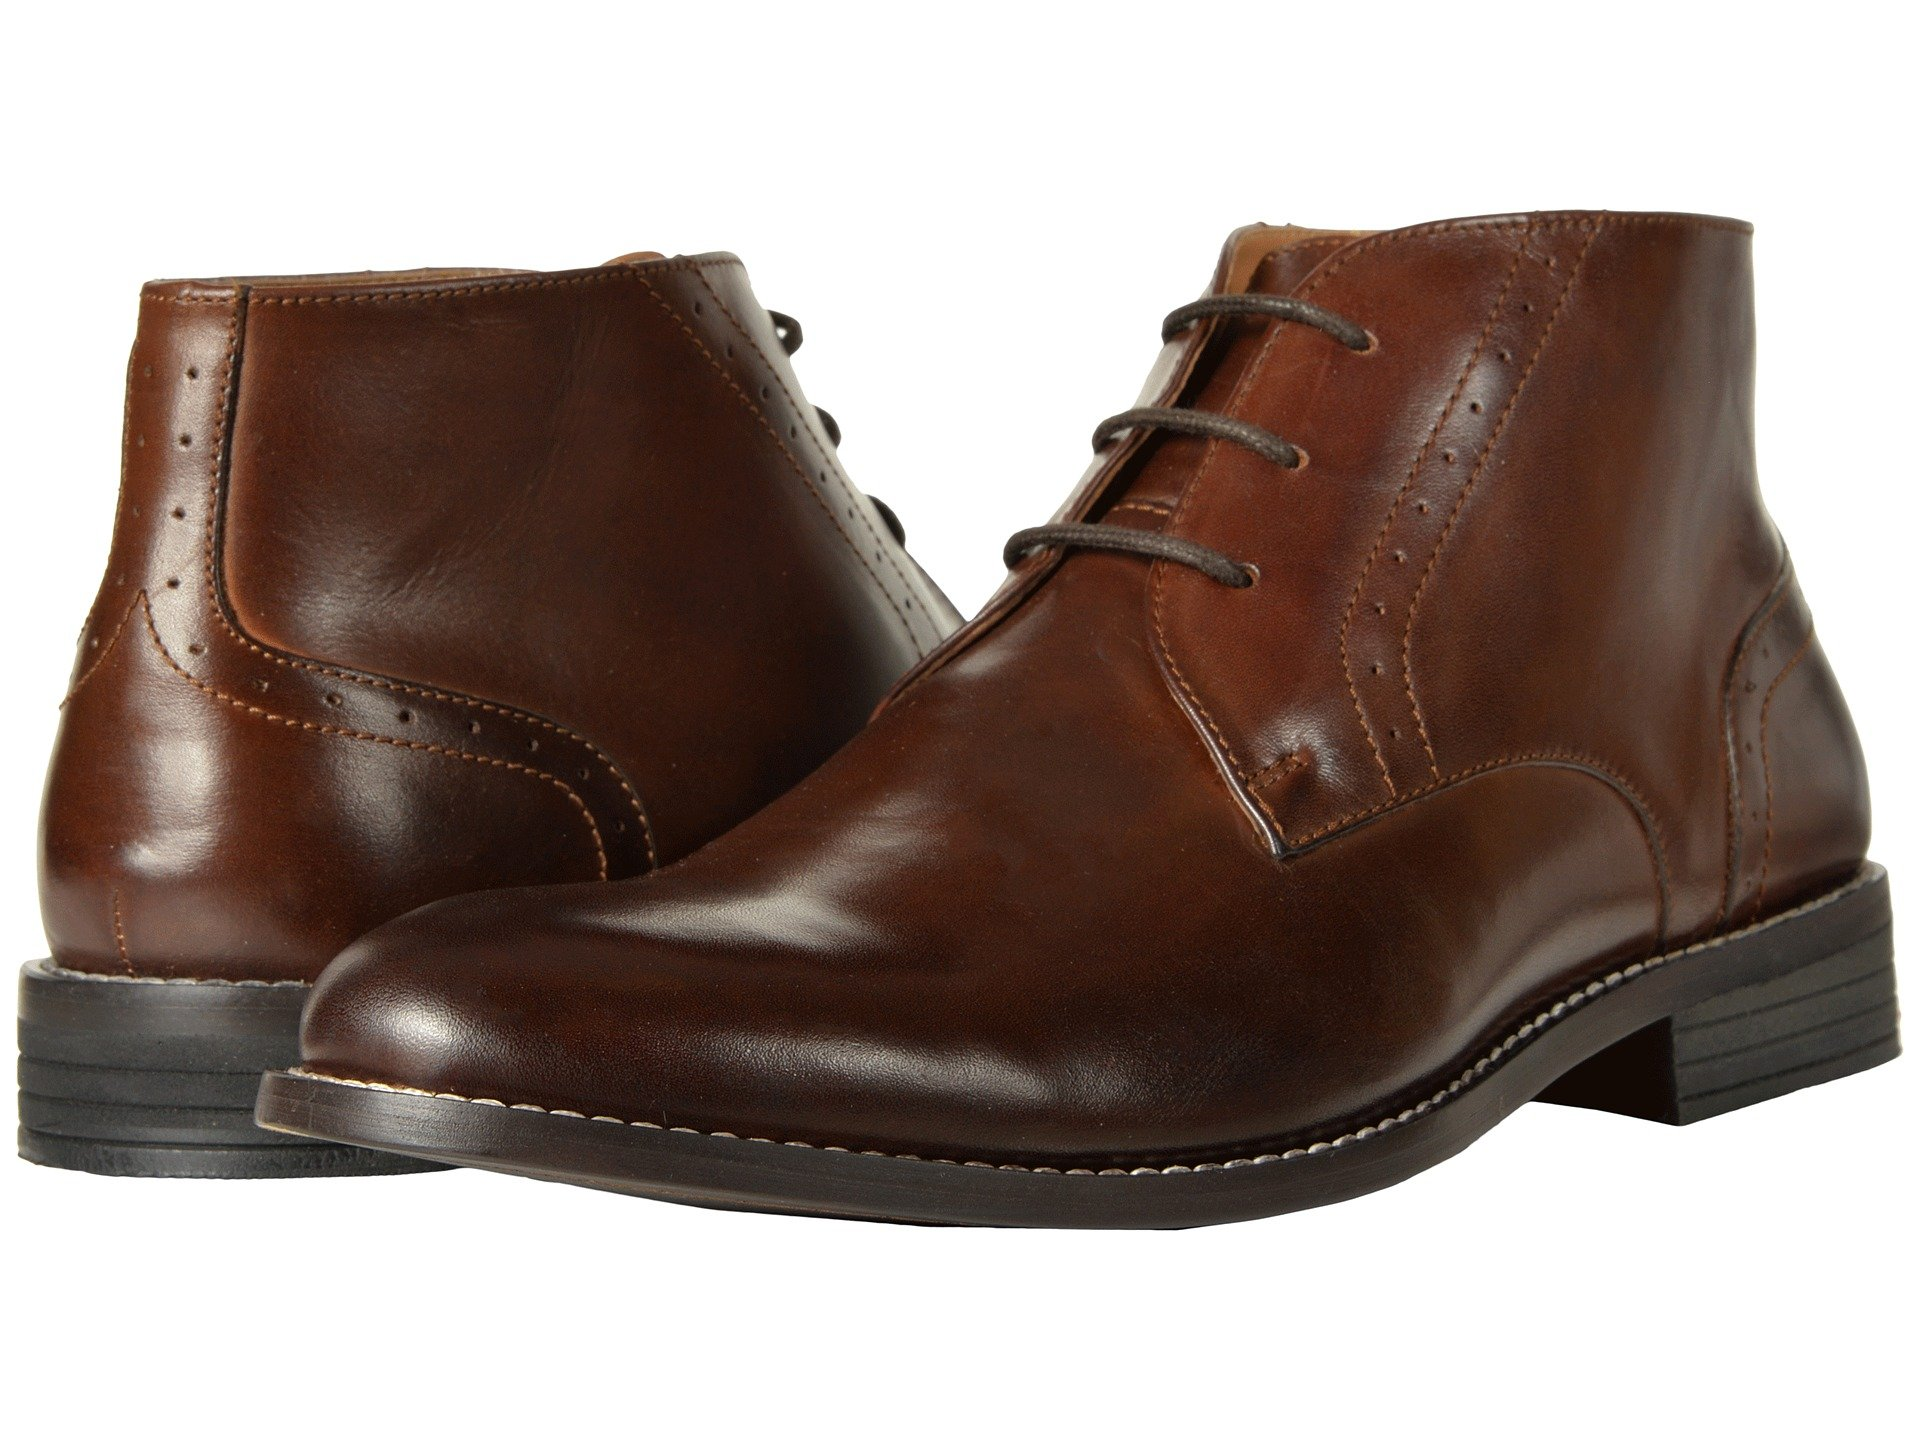 Bush Chukka Plain Toe Brown Boot Savage Nunn gRxzdHww